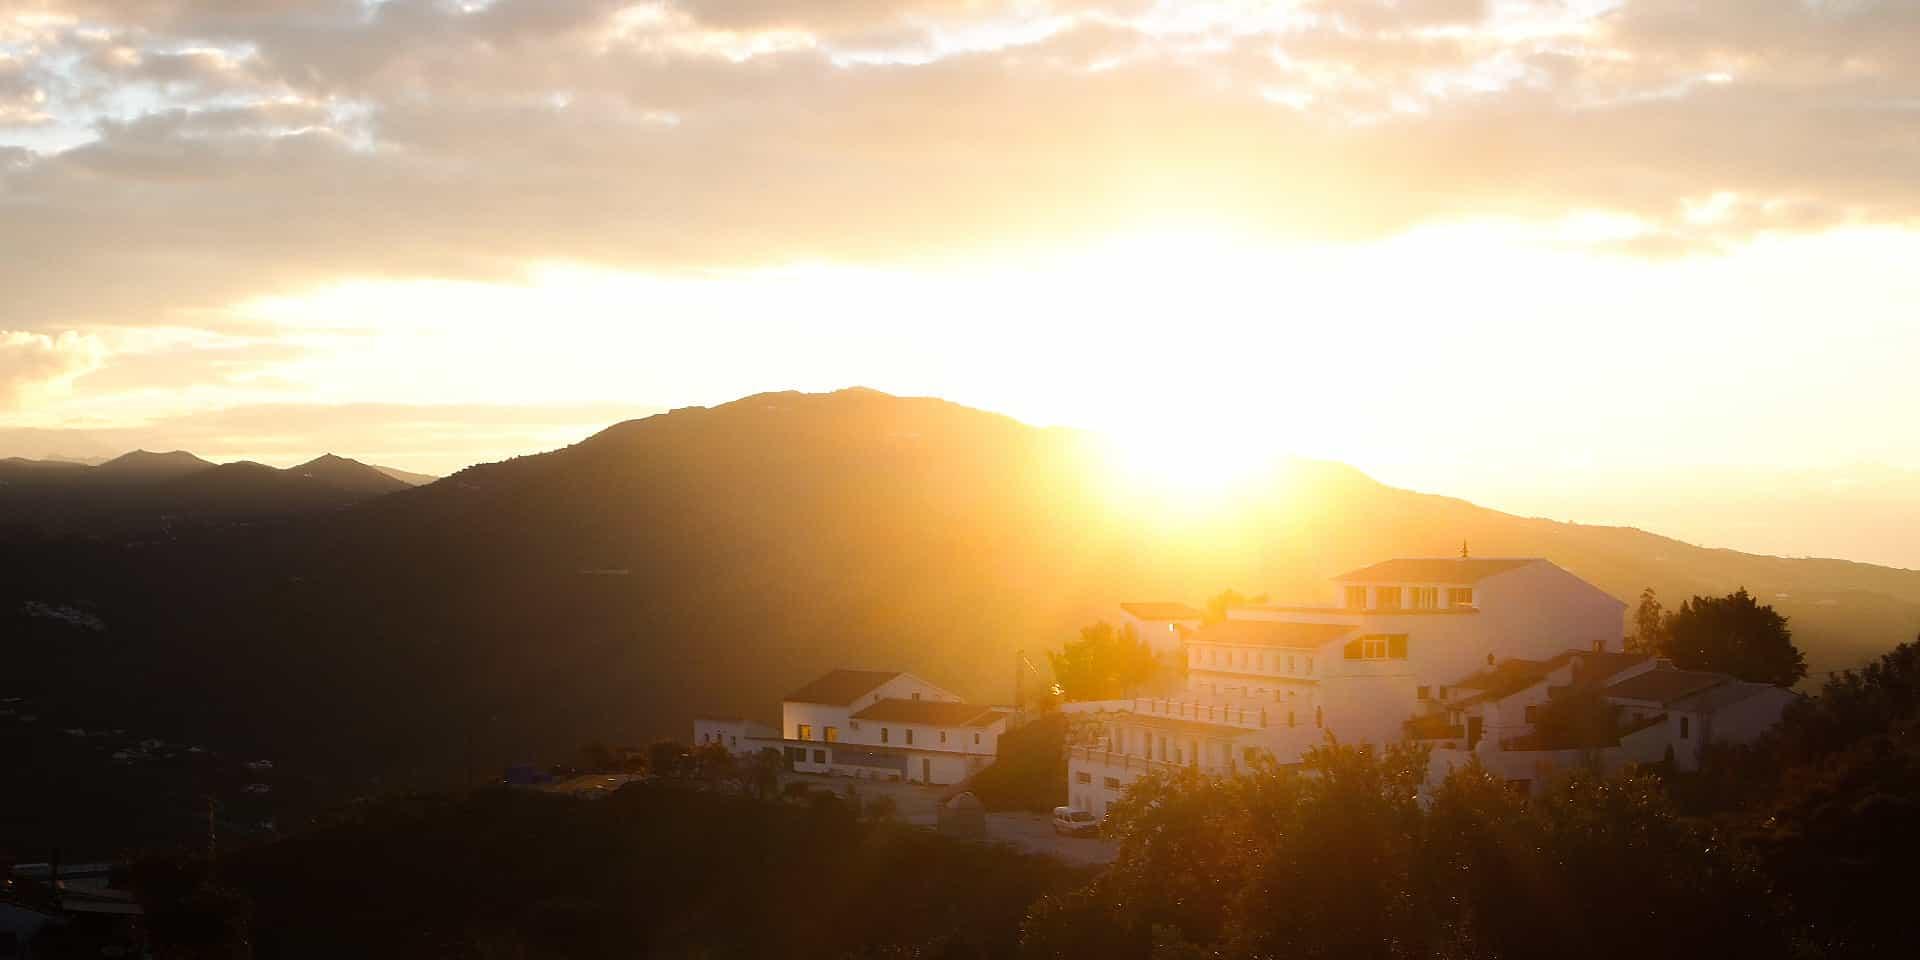 Karma Guen Retreat Center